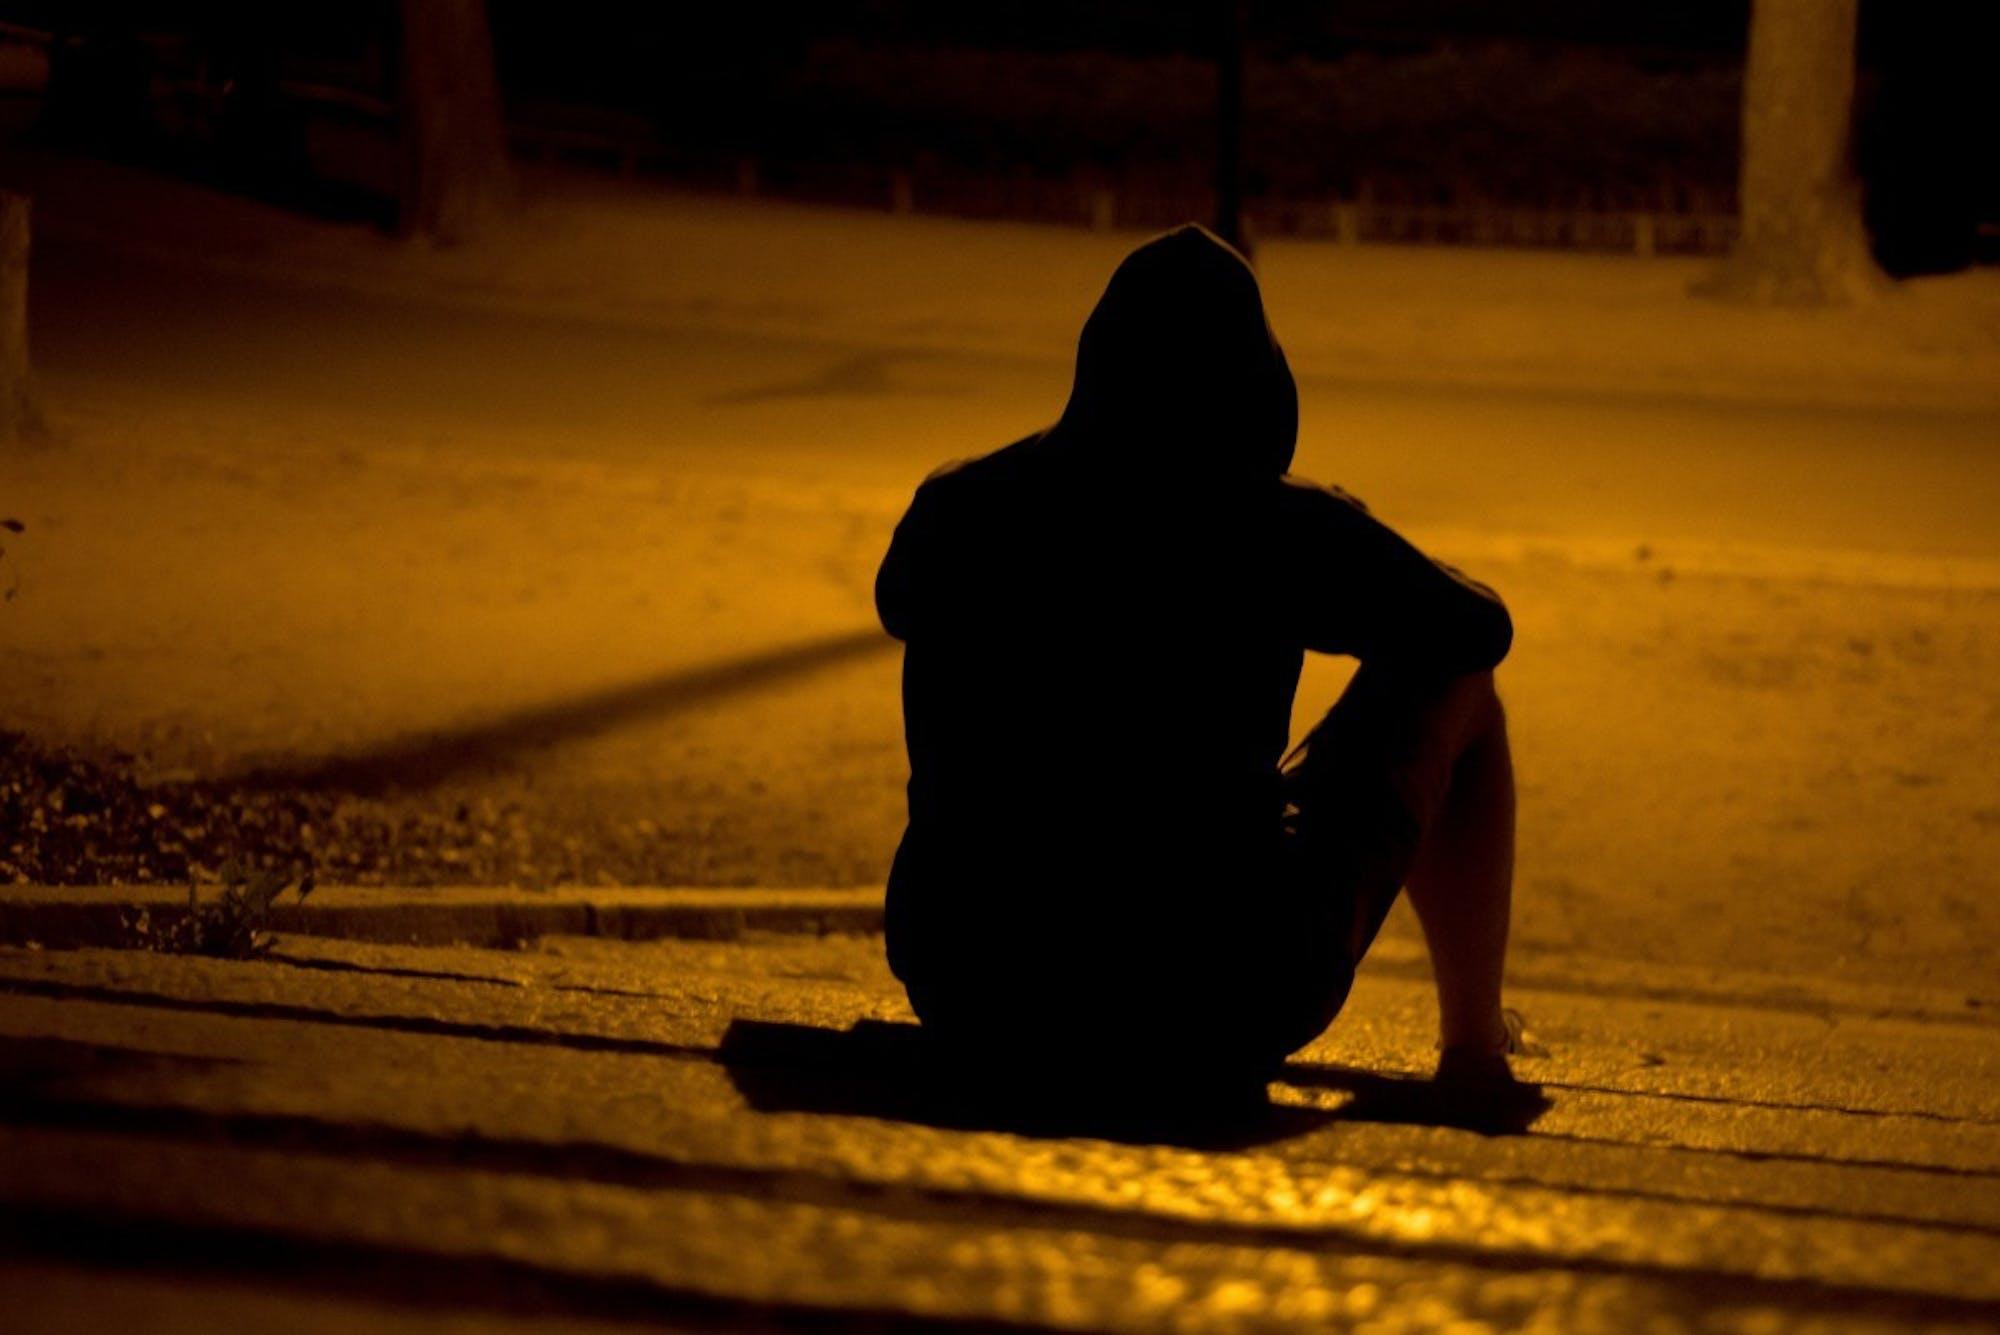 man_lonely_park_night_dark_mystery_alone_male-623883